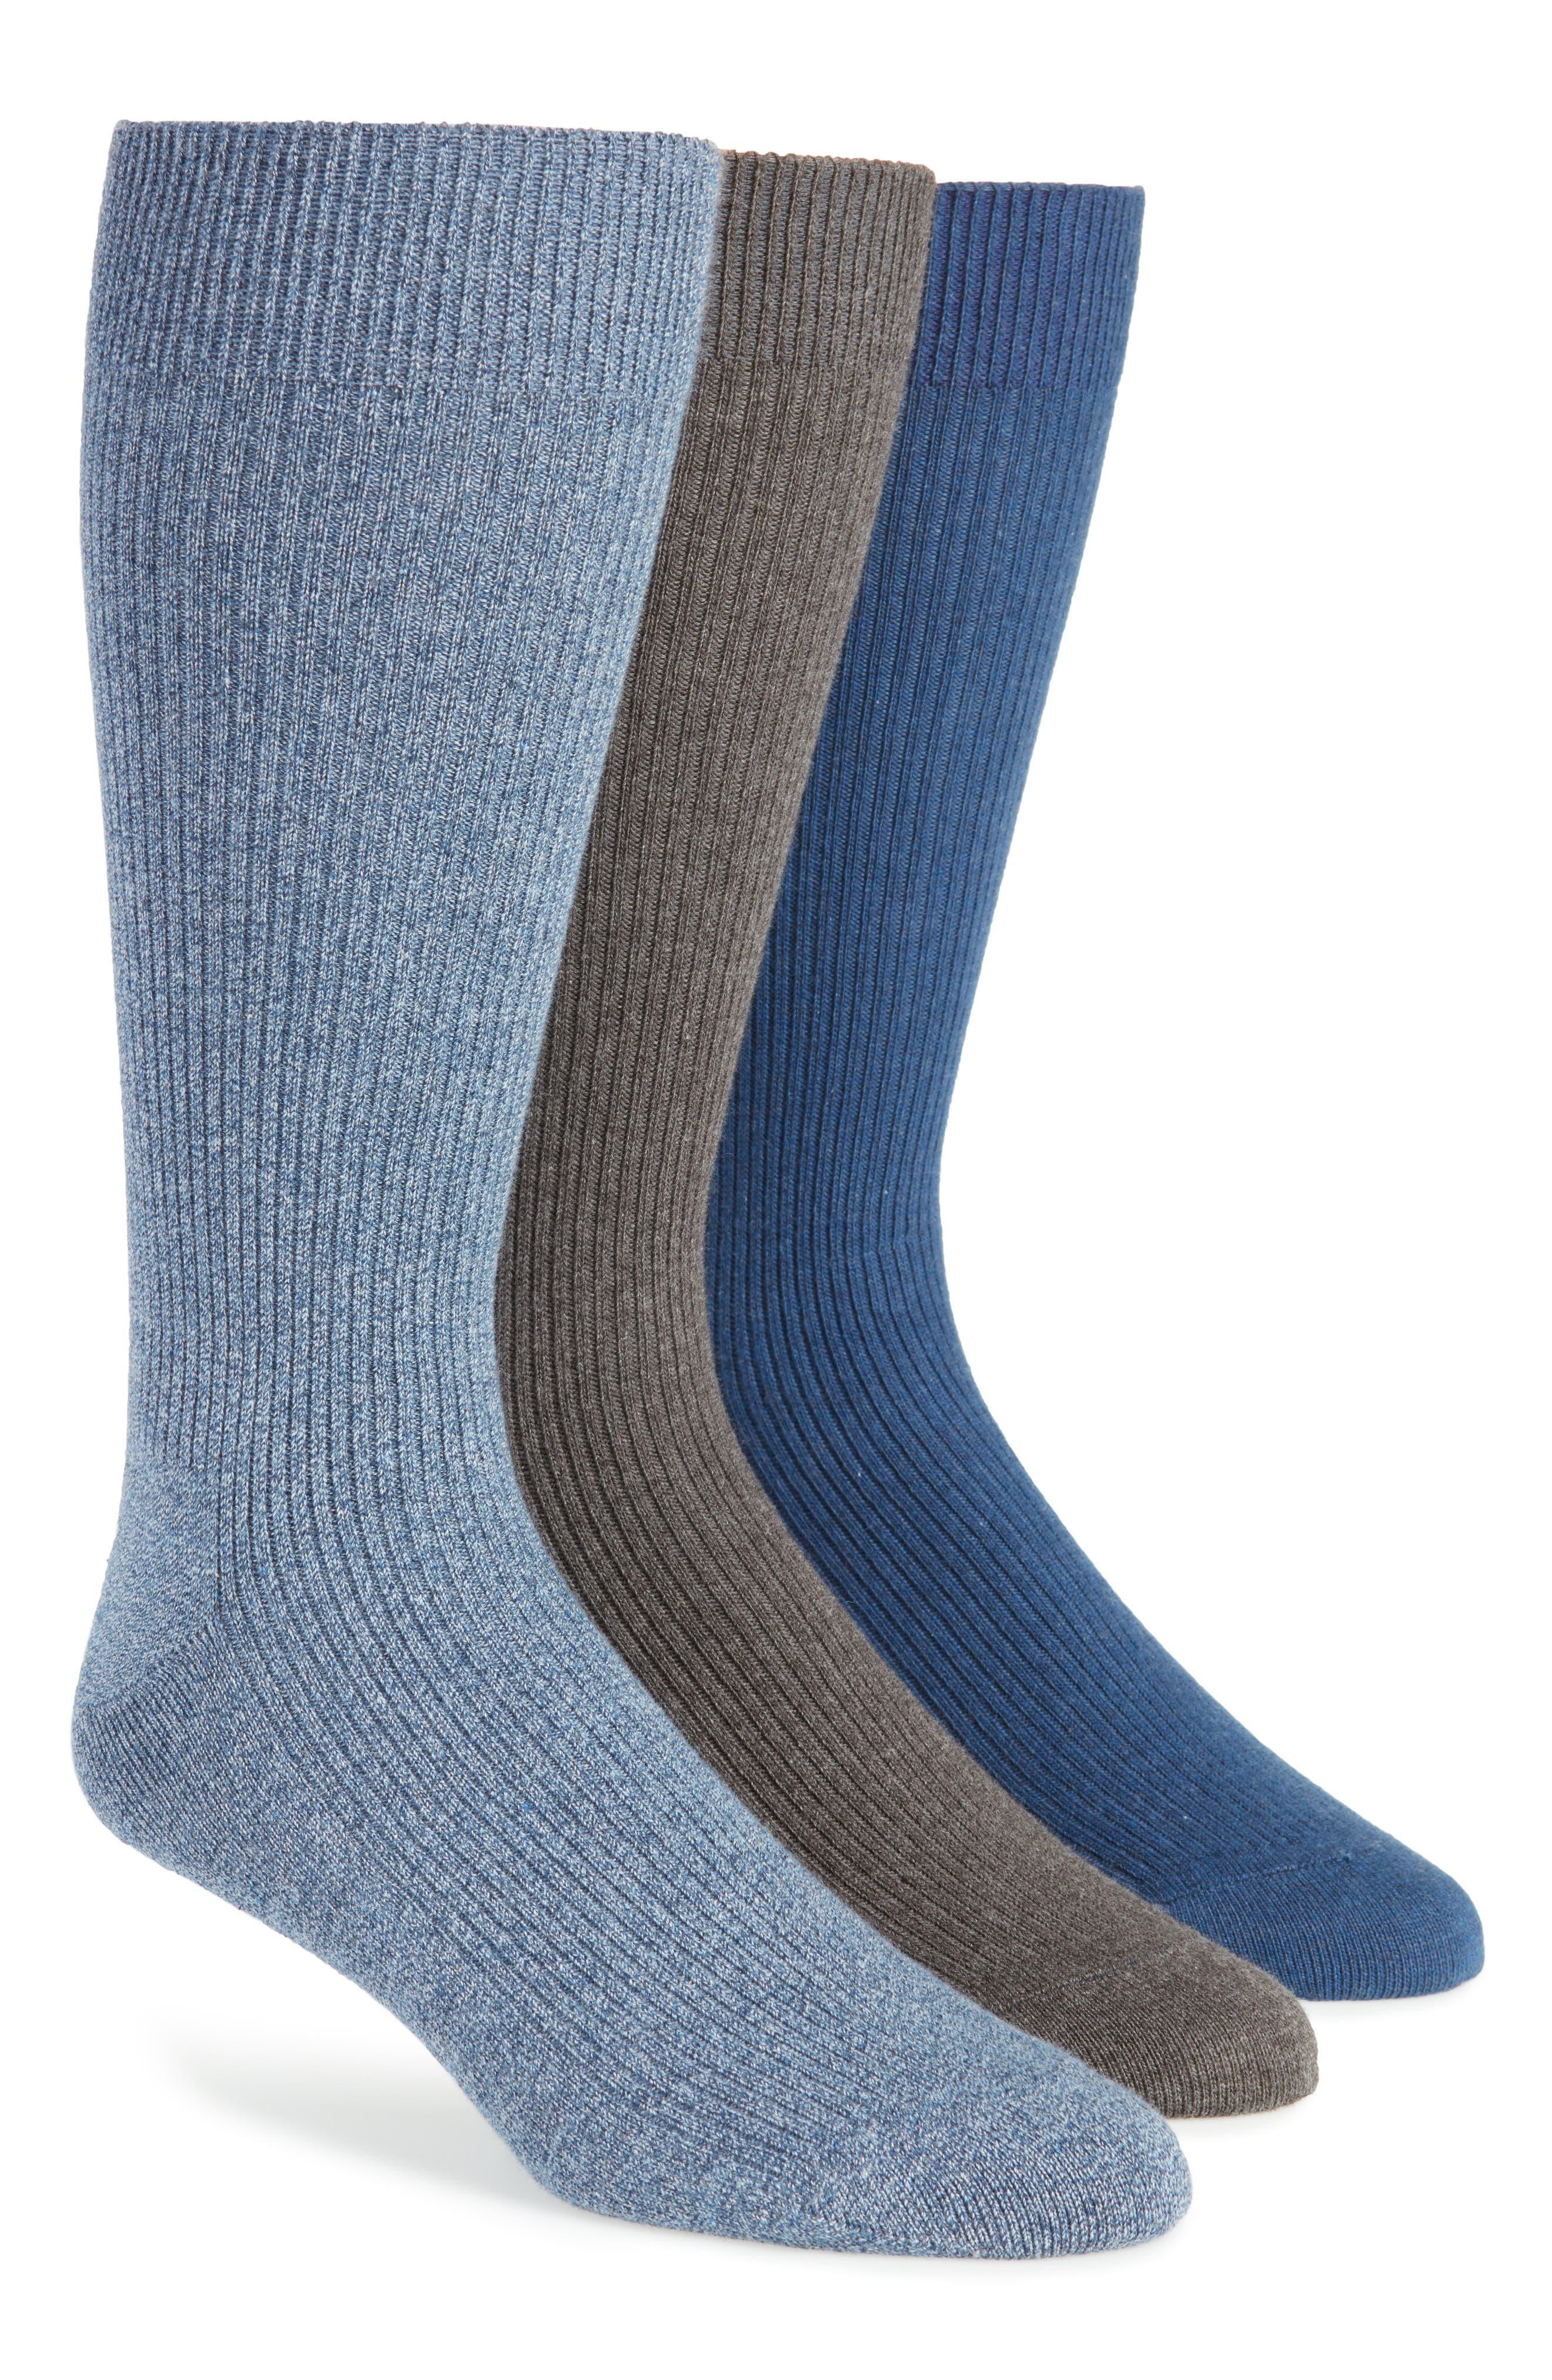 3-Pack Socks,                             Main thumbnail 2, color,